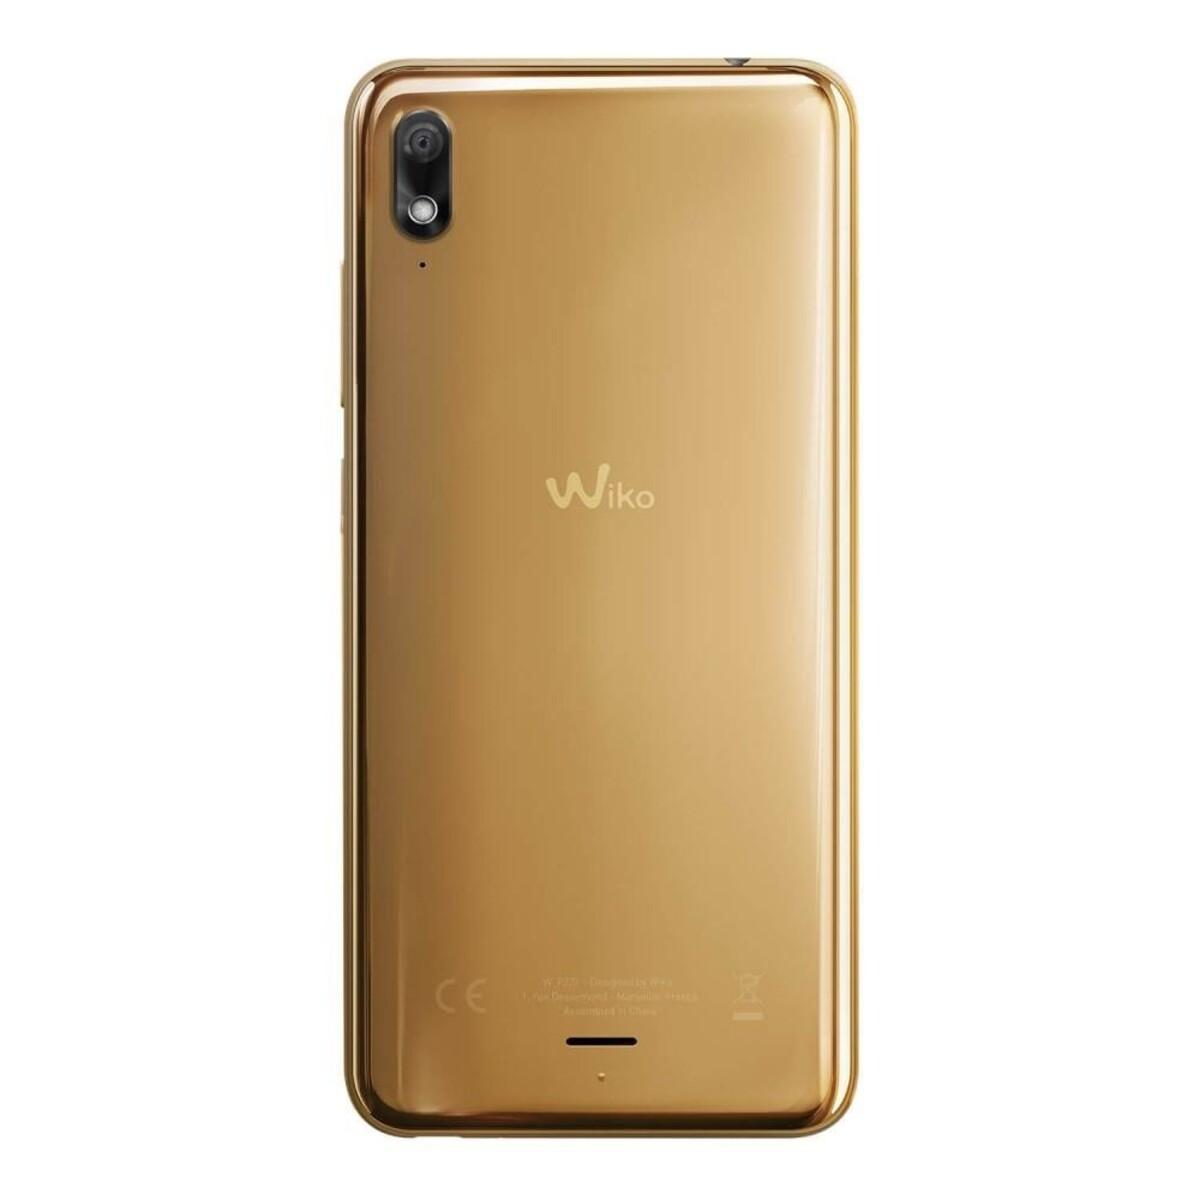 Bild 5 von Wiko View 2 Go Dual-SIM gold Smartphone (5,93 Zoll, 32 GB, 4.000-mAh, Octa-Core, Fingerabdrucksensor)